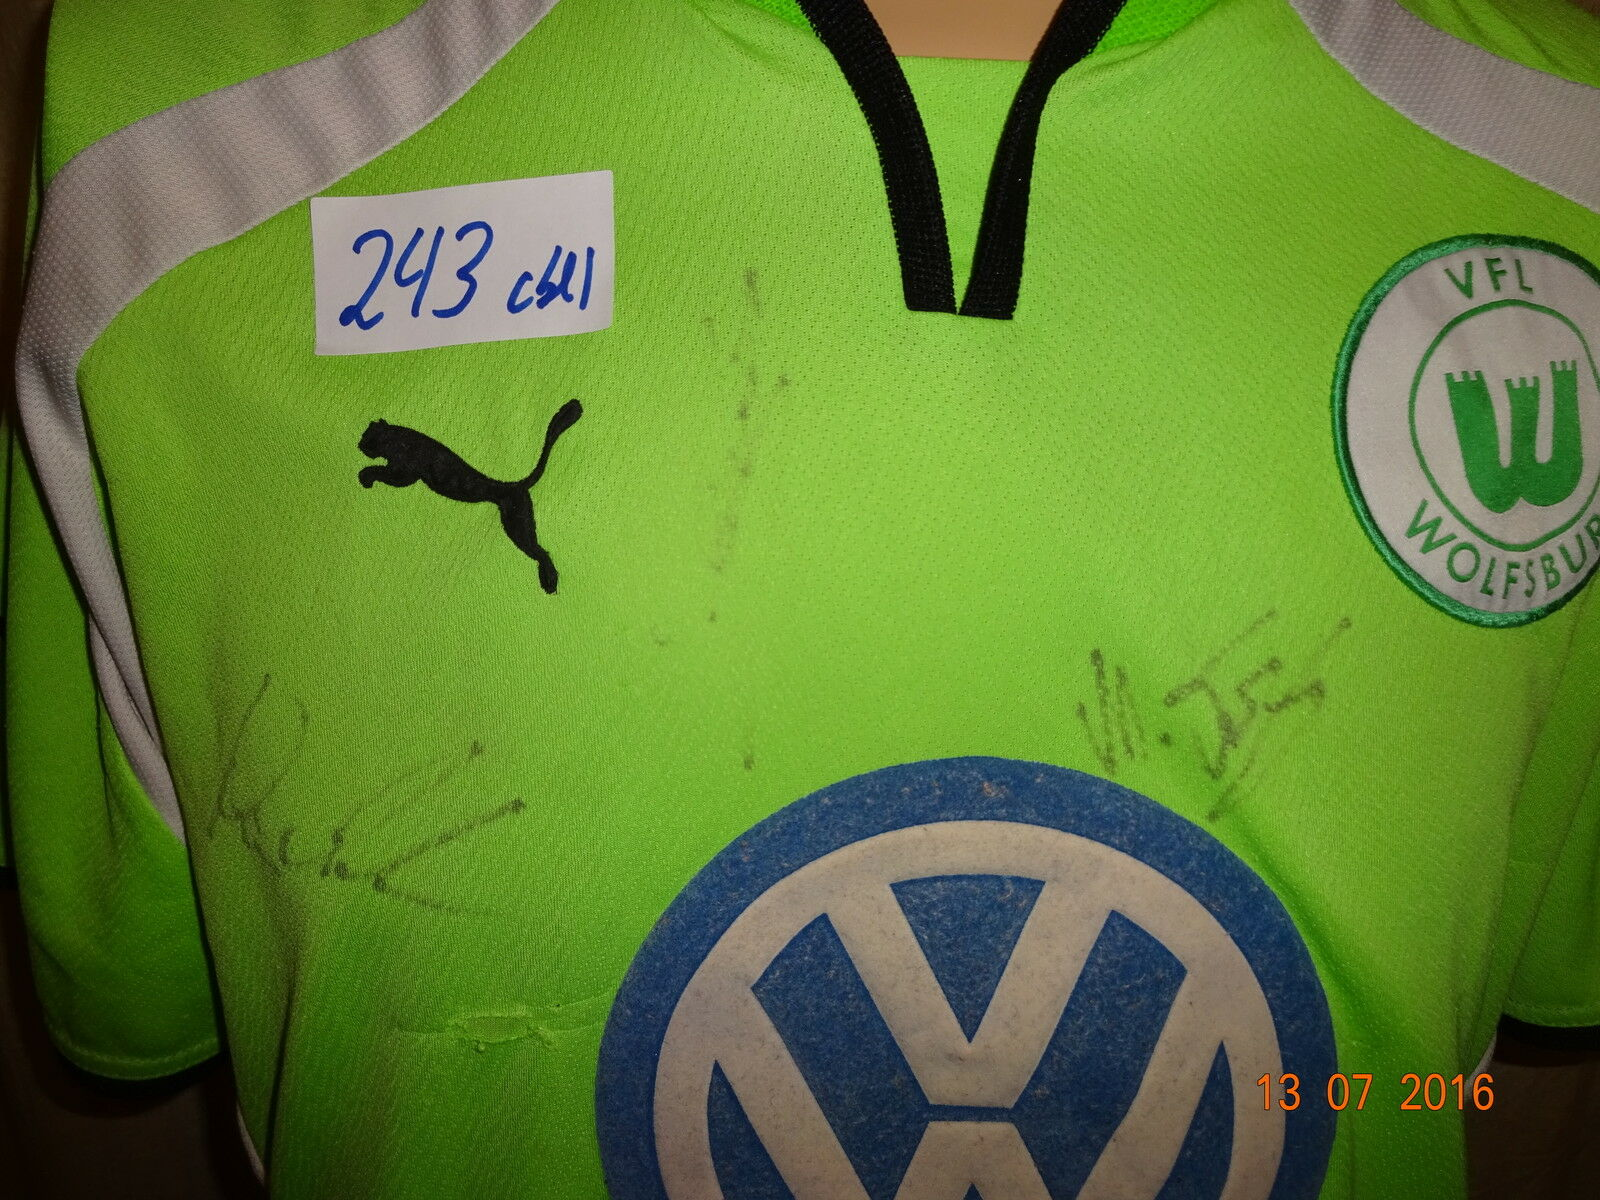 VfL Wolfsburg 2000/01 Puma Trikot 2000/01 Wolfsburg